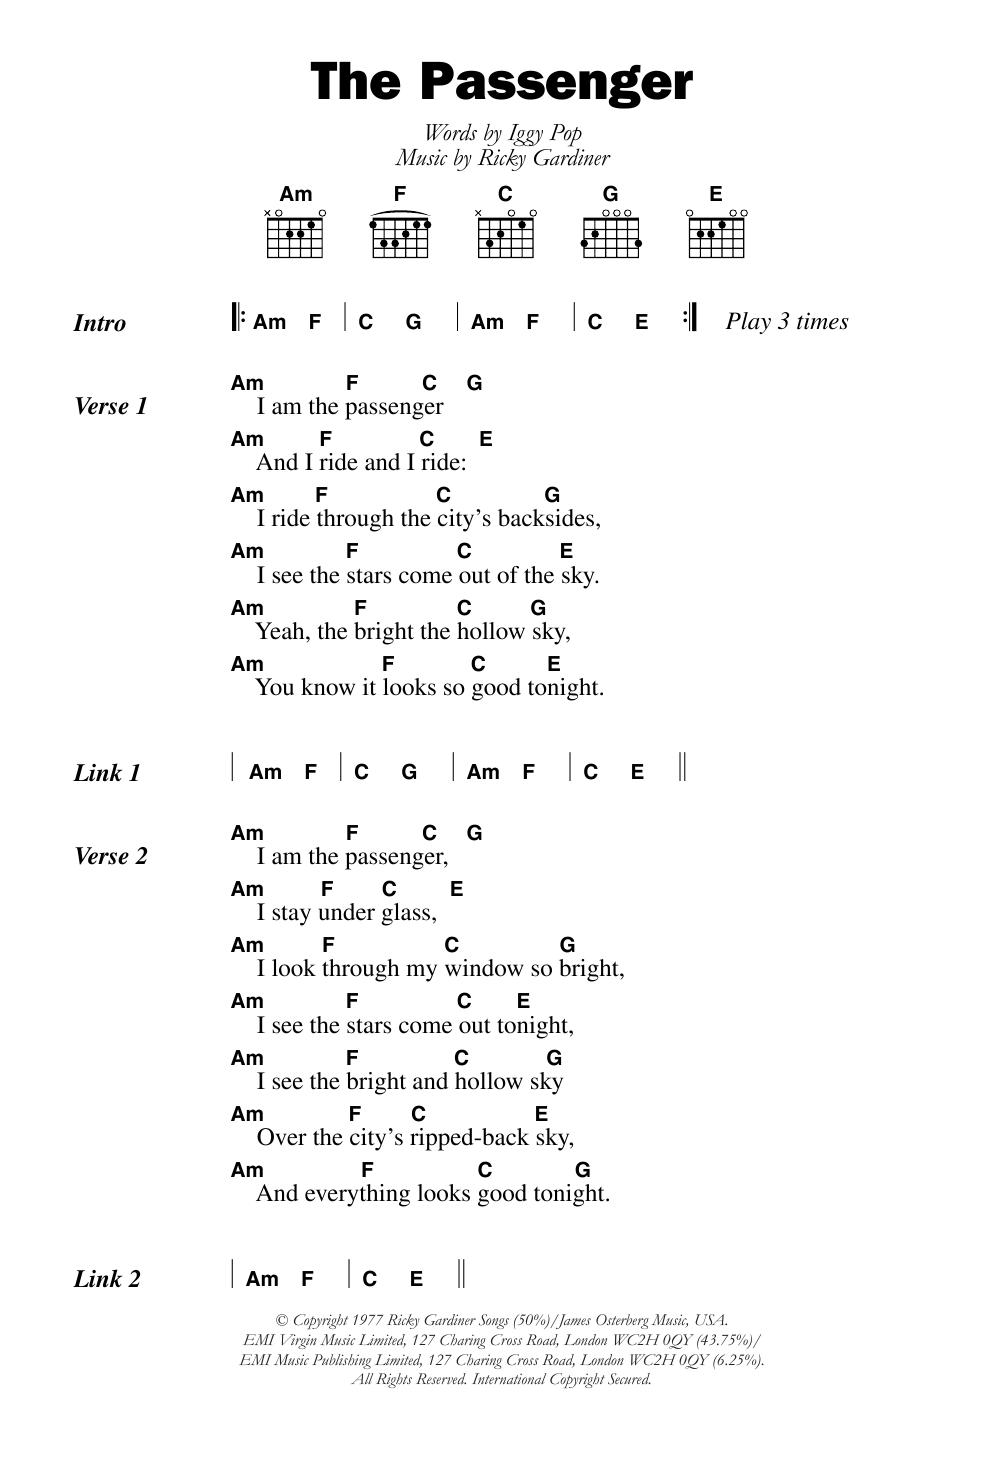 Sheet Music Digital Files To Print Licensed Ricky Gardiner Digital